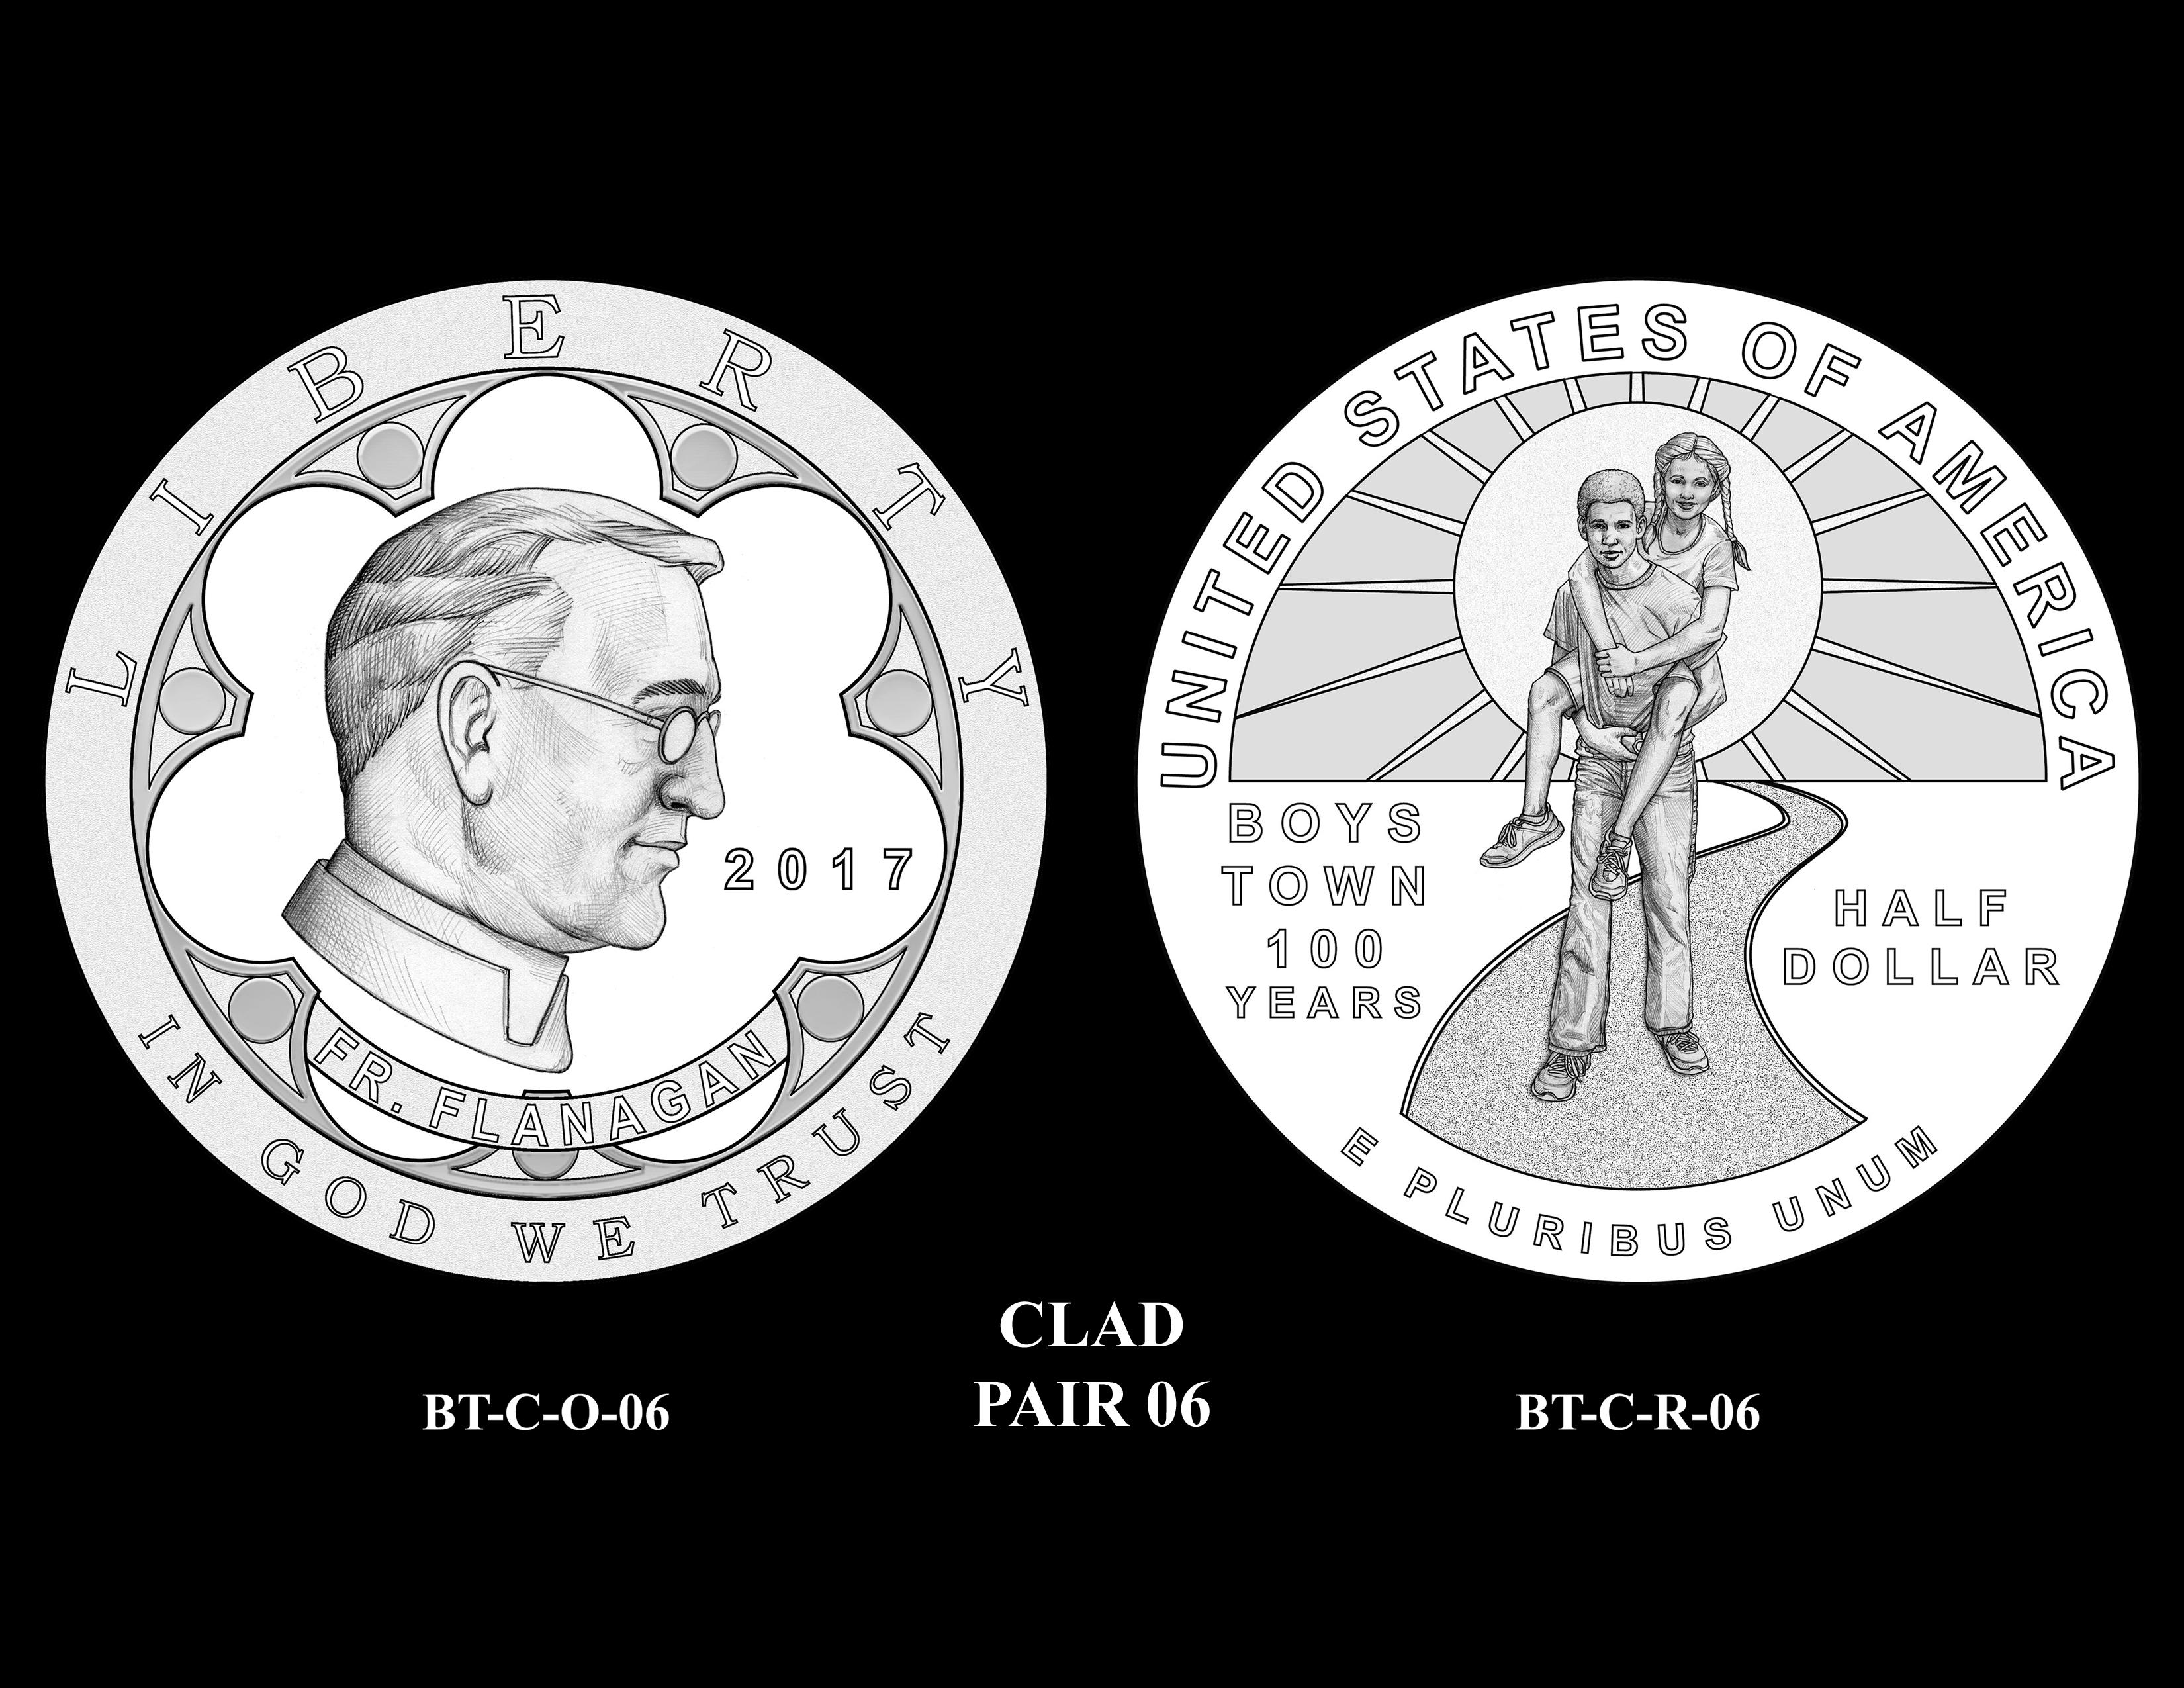 Clad-Pair-06 -- 2017 Boystown Centennial Commemorative Coin  Program